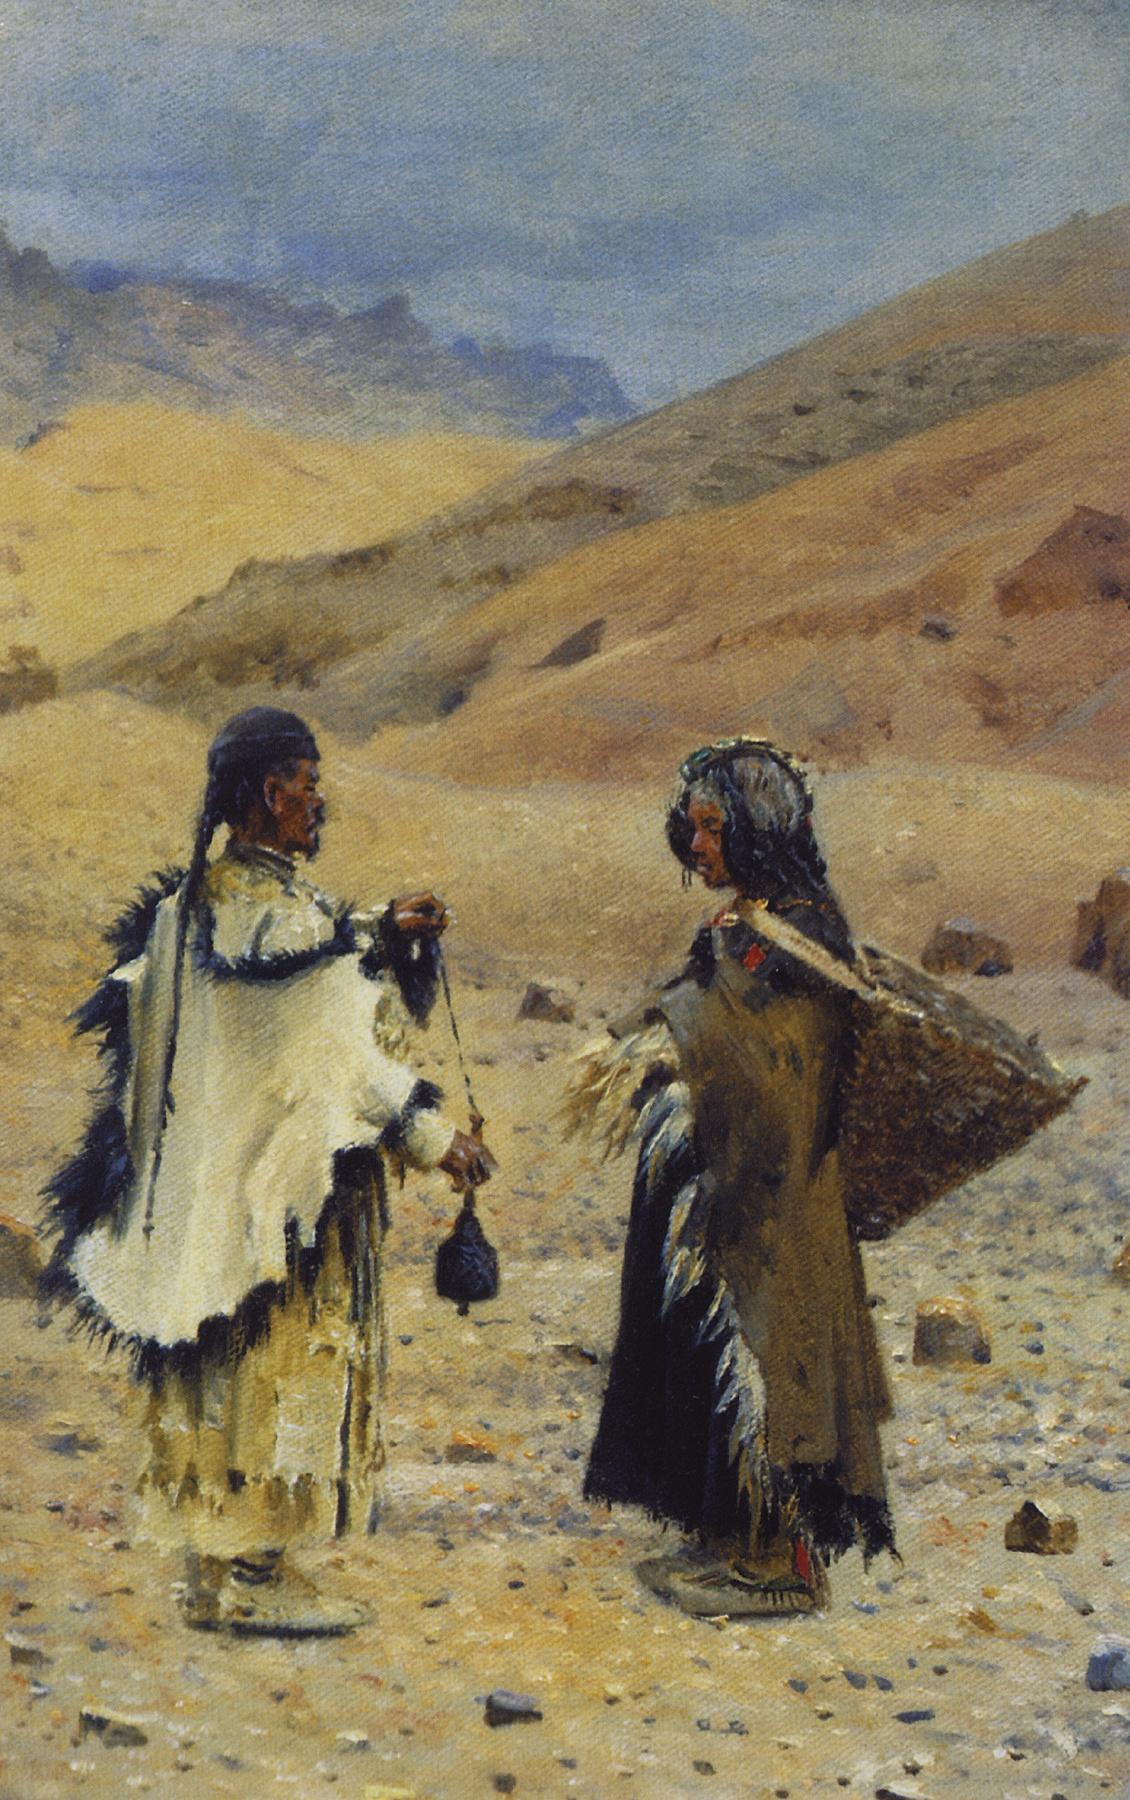 Vasily Vereshchagin. Residents Of Western Tibet